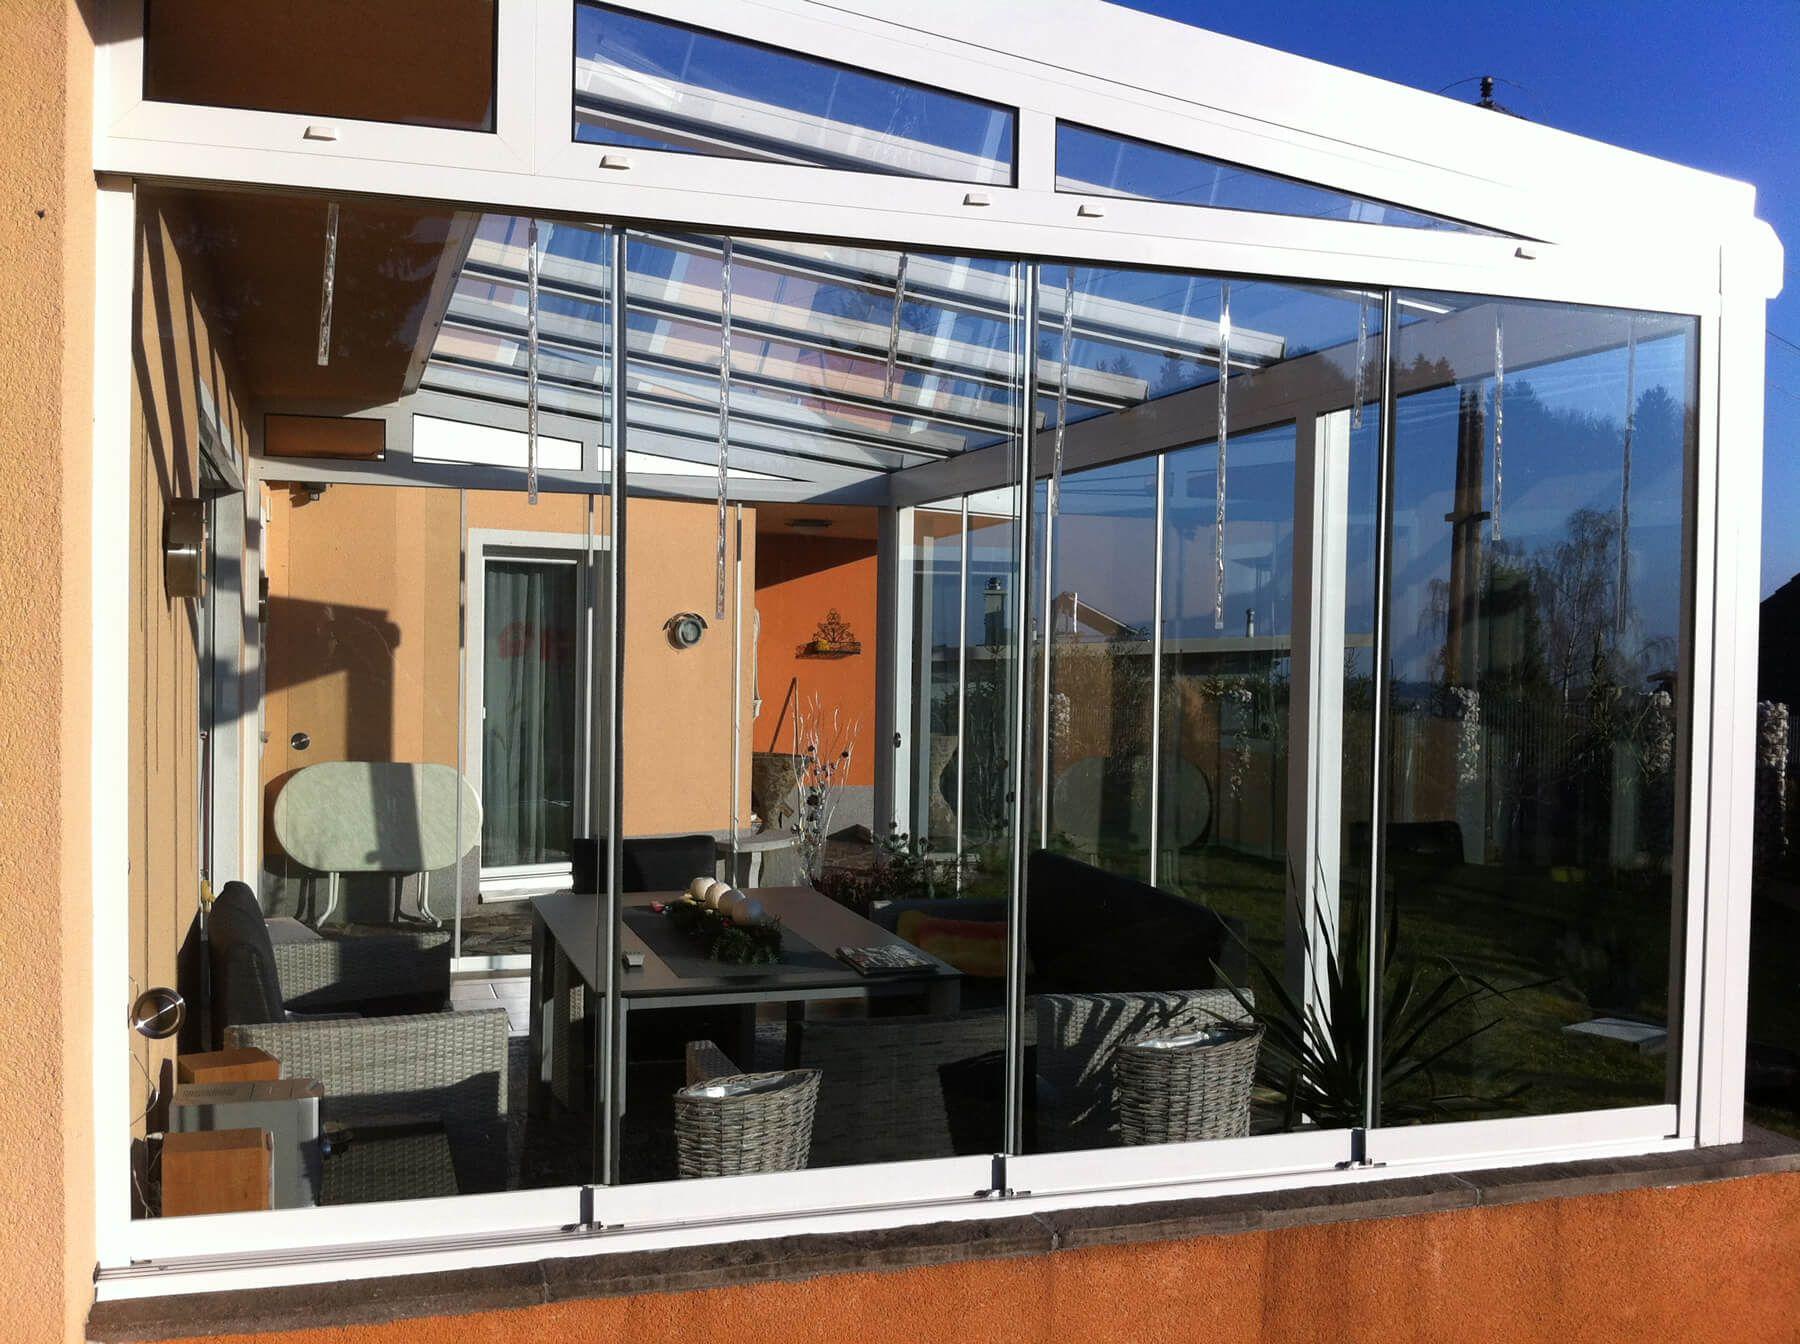 Glasschiebewand Aussen Fur Wintergarten In 2018 Garten Ideen